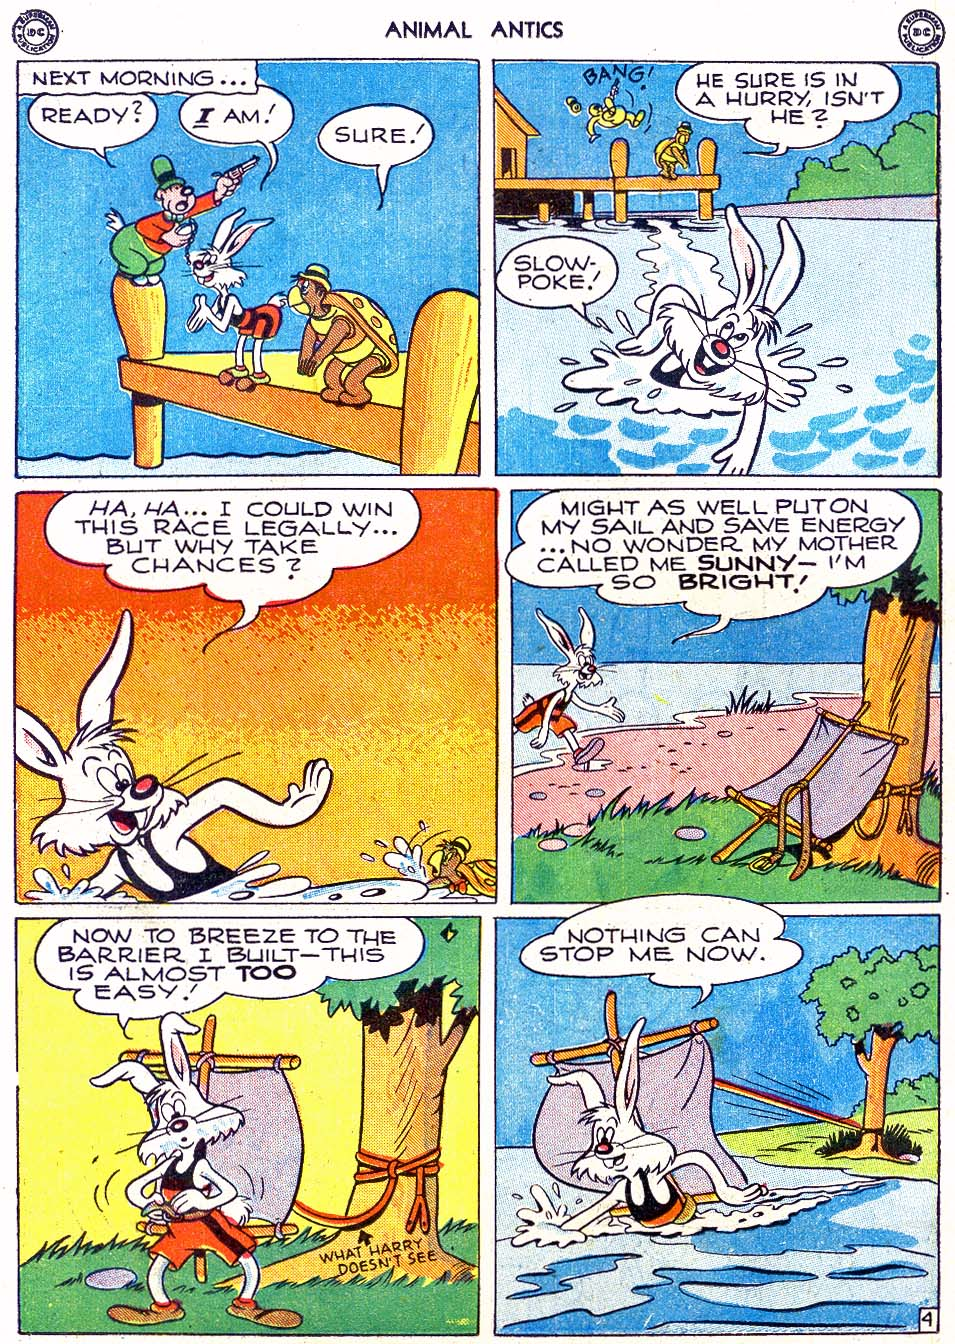 Read online Animal Antics comic -  Issue #4 - 26